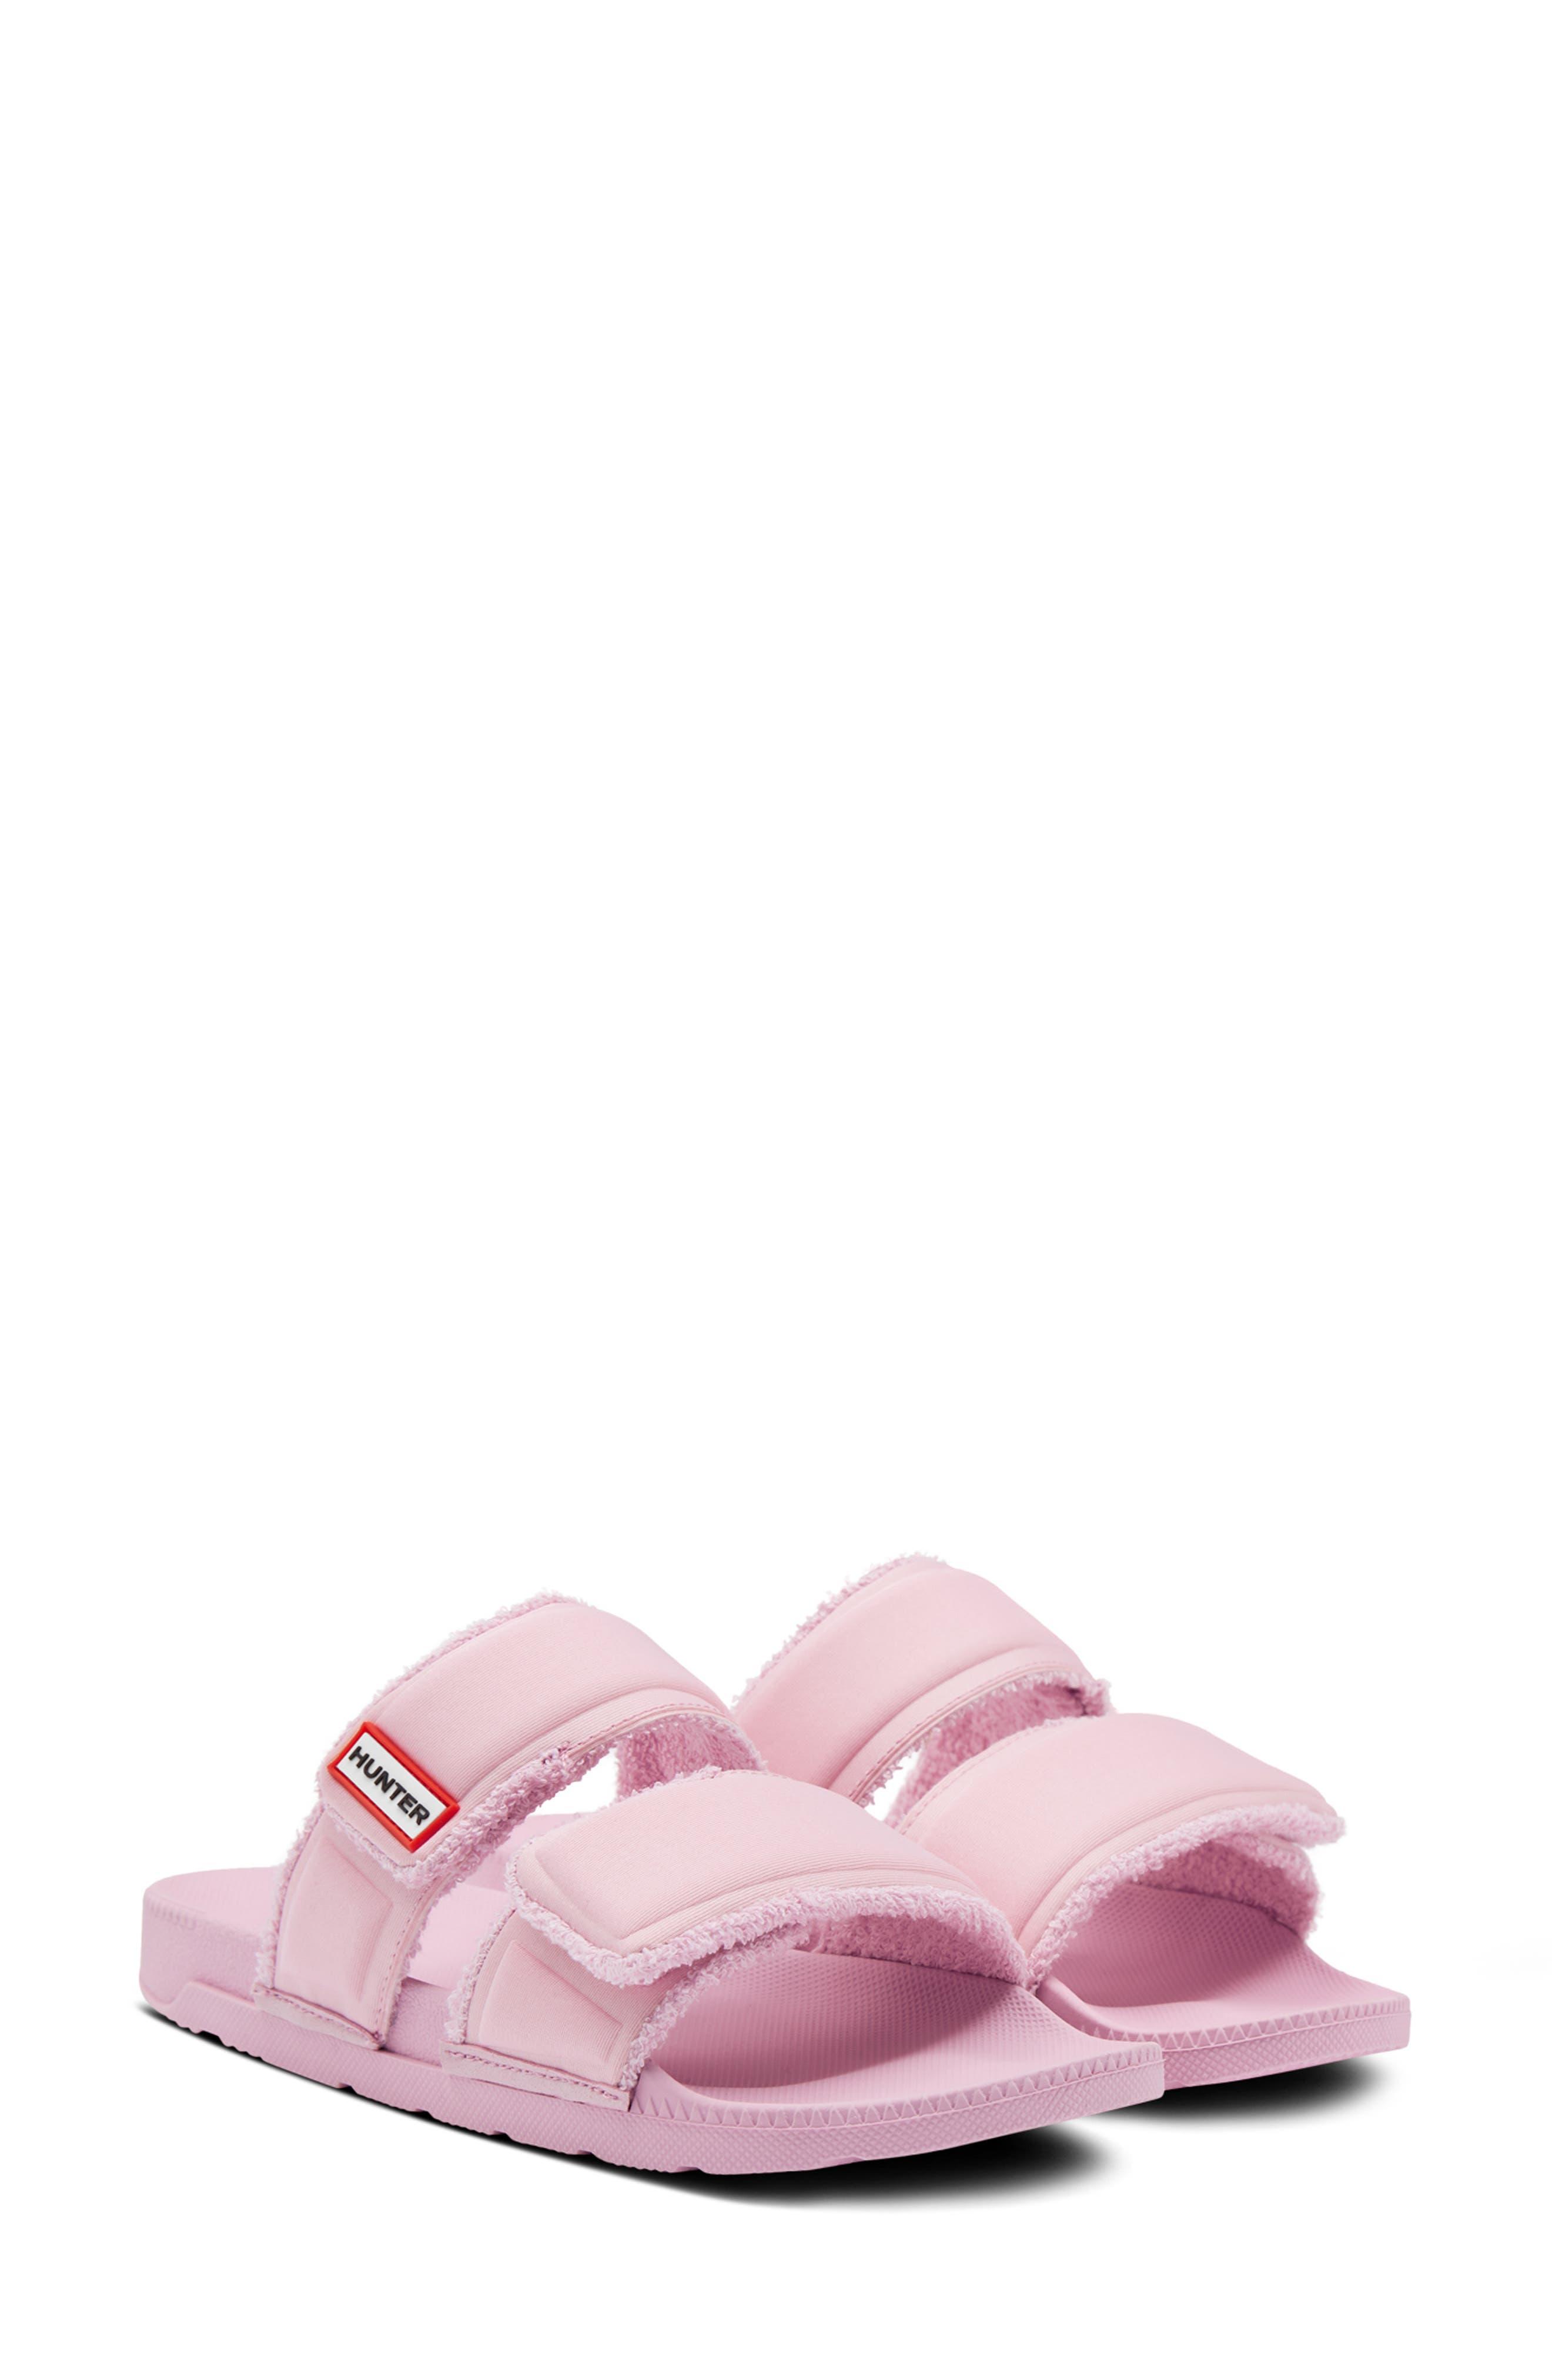 Original Two-Strap Slide Sandal